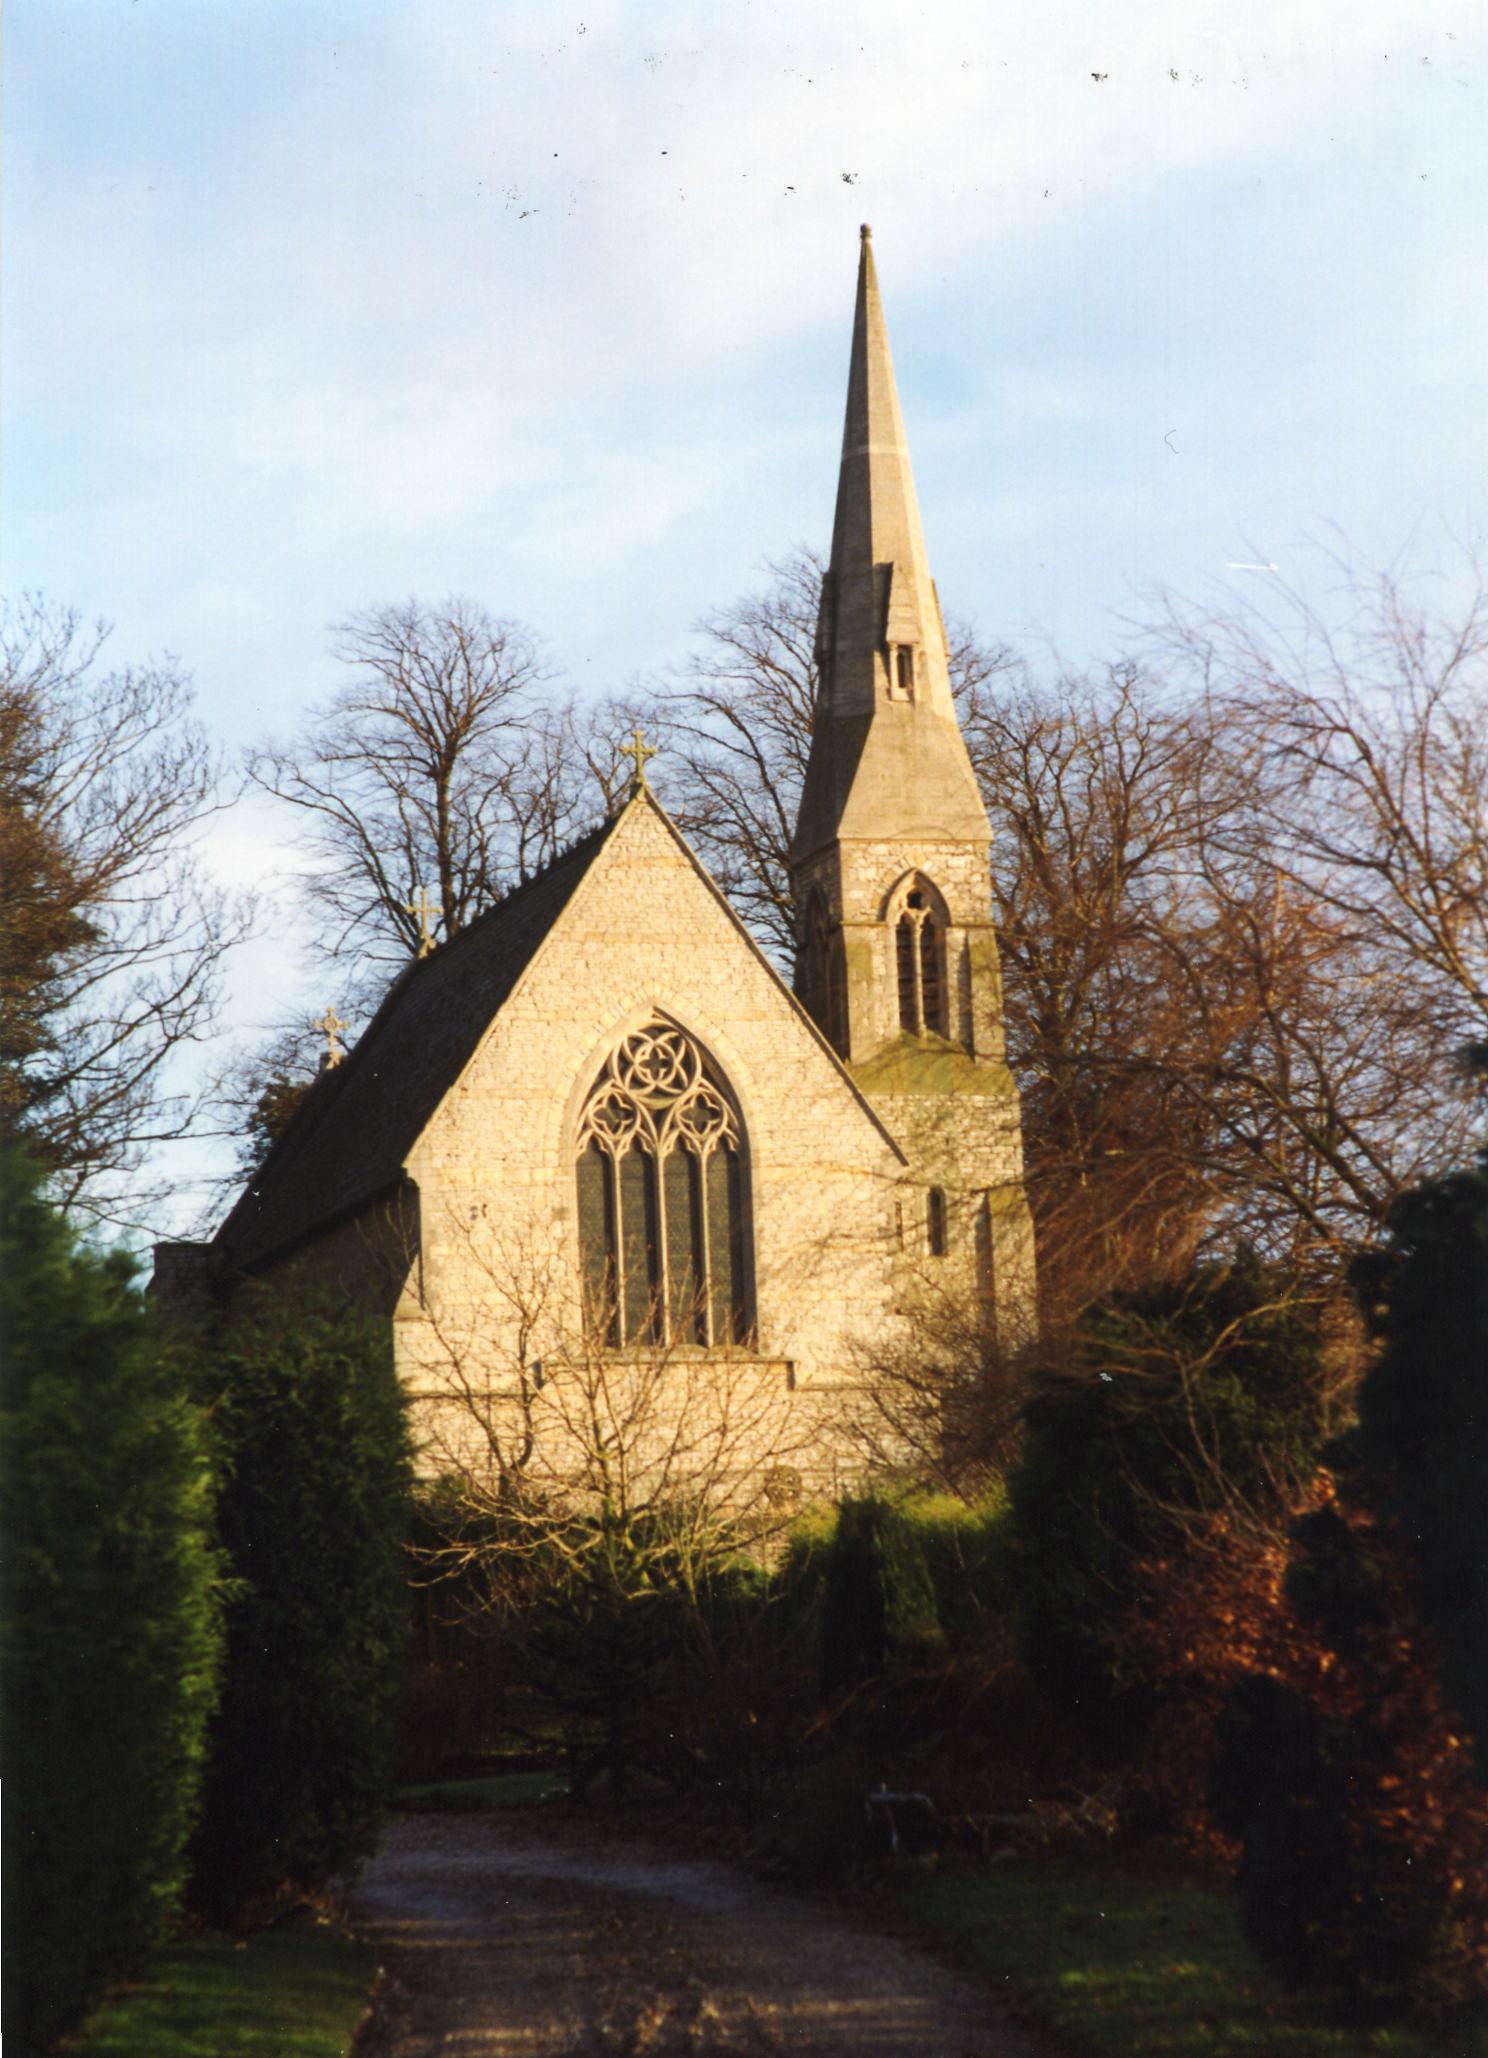 St. Hibald's Church